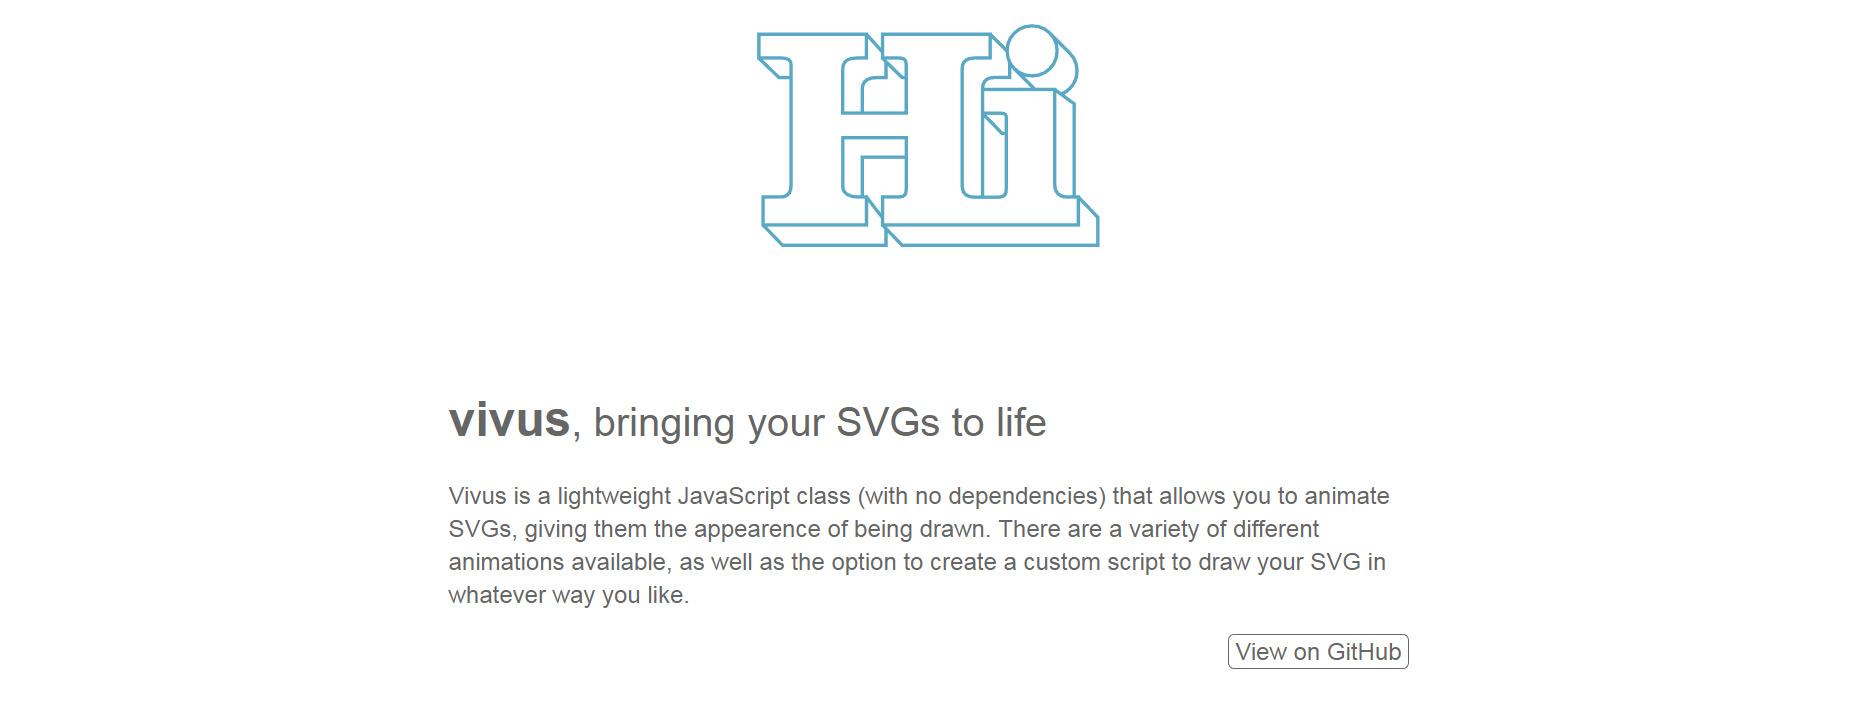 08-vivus-js-homepage